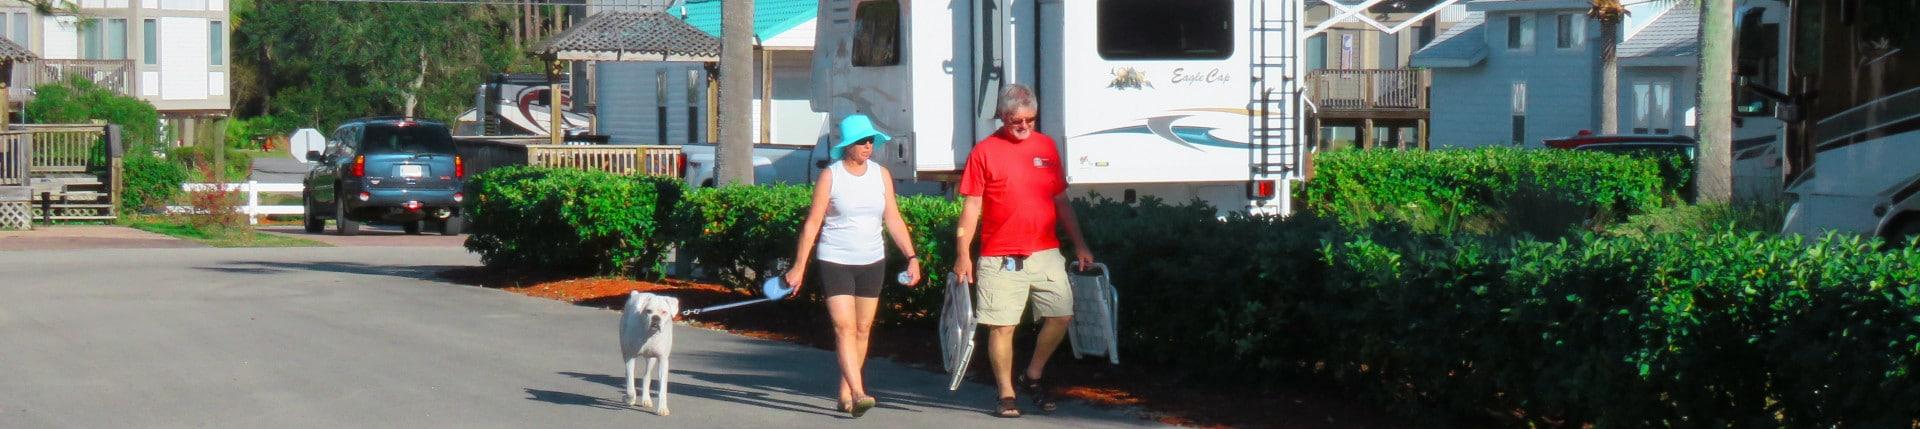 Couple Walking Dog at Carrabelle Beach RV Resort